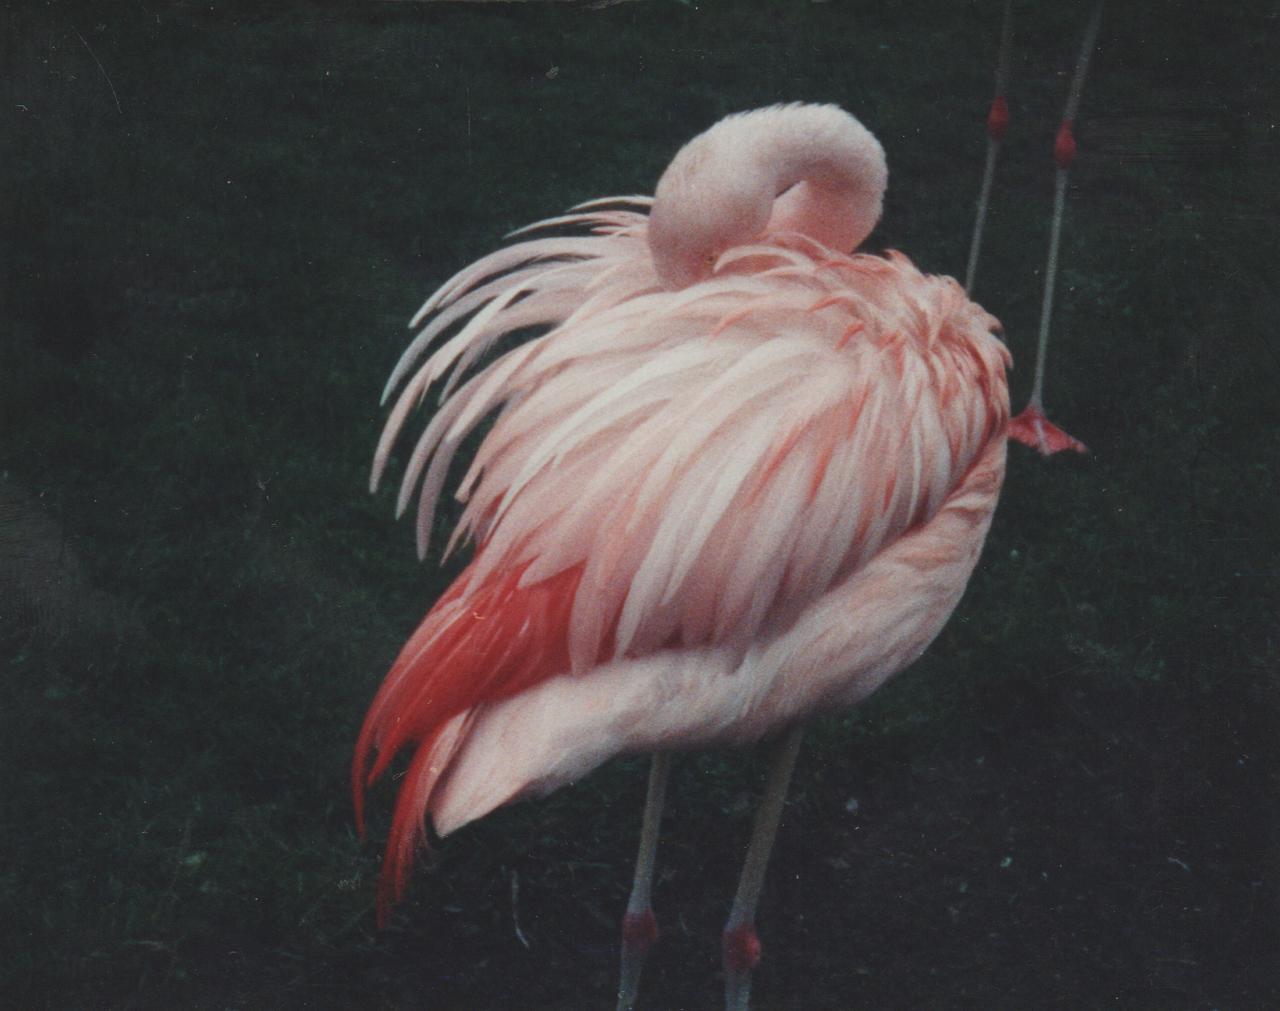 1992-12-26 - Saturday - Wildlife Safari Trip, Marilyn, Crystal-20.png